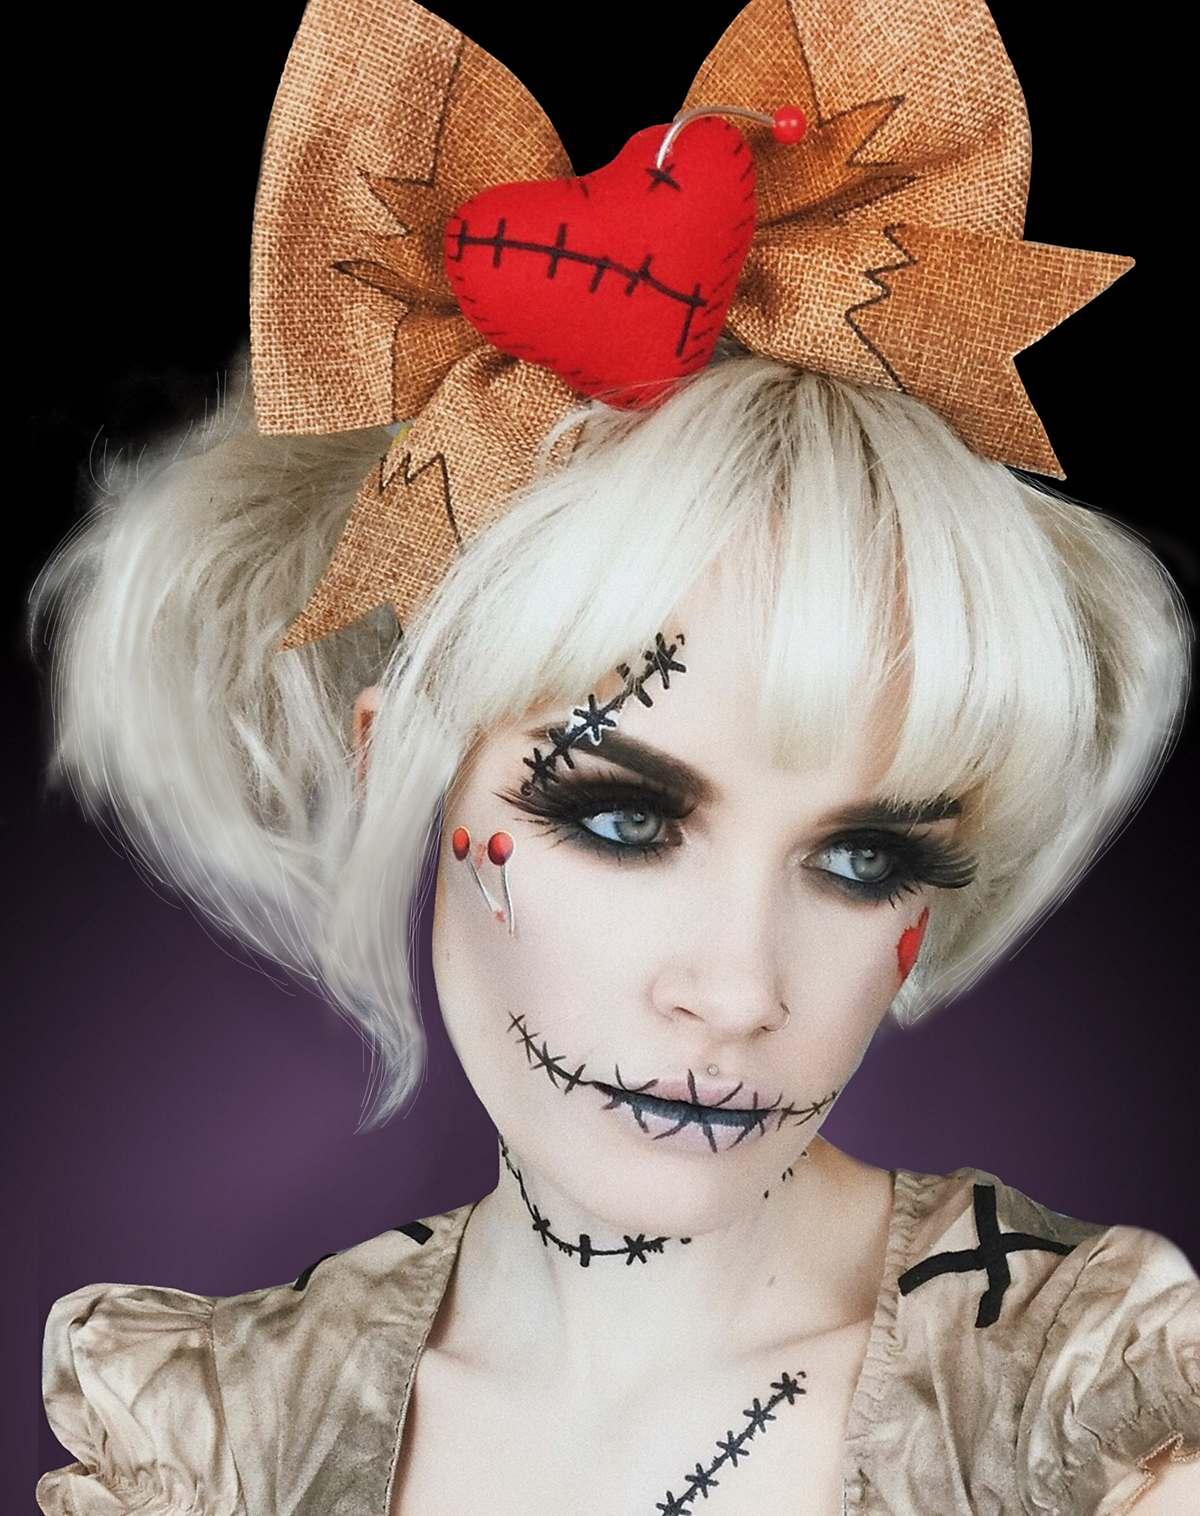 7 simple halloween costume ideas for 2018 – spirit halloween blog